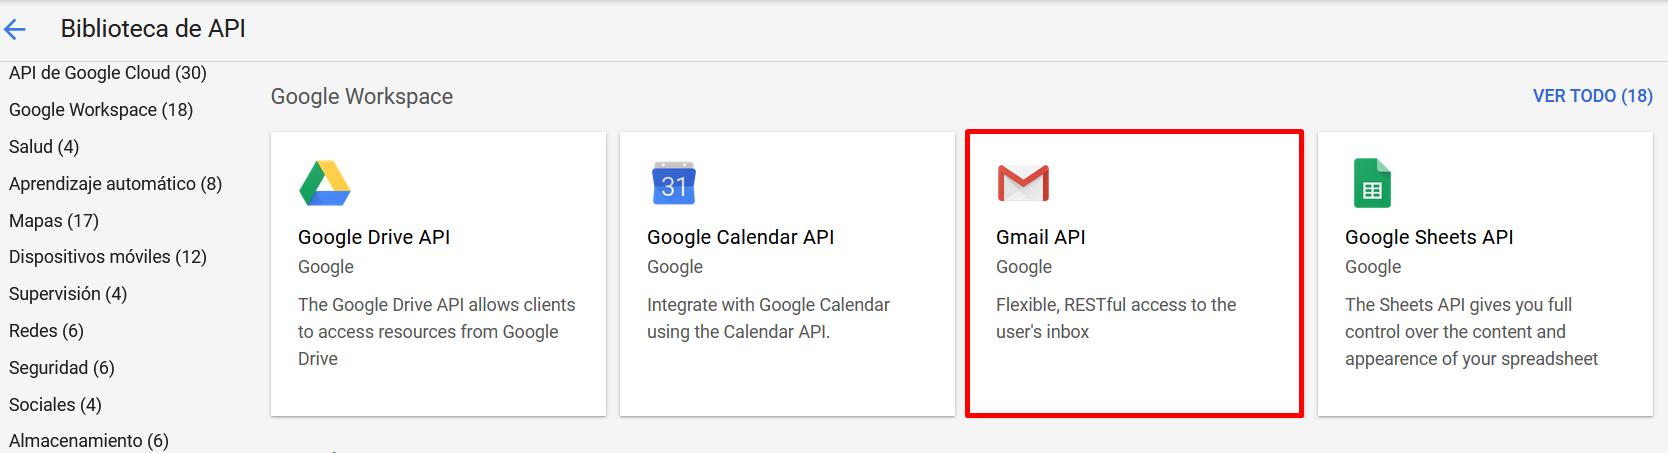 Biblioteca Gmail Api en Google Cloud